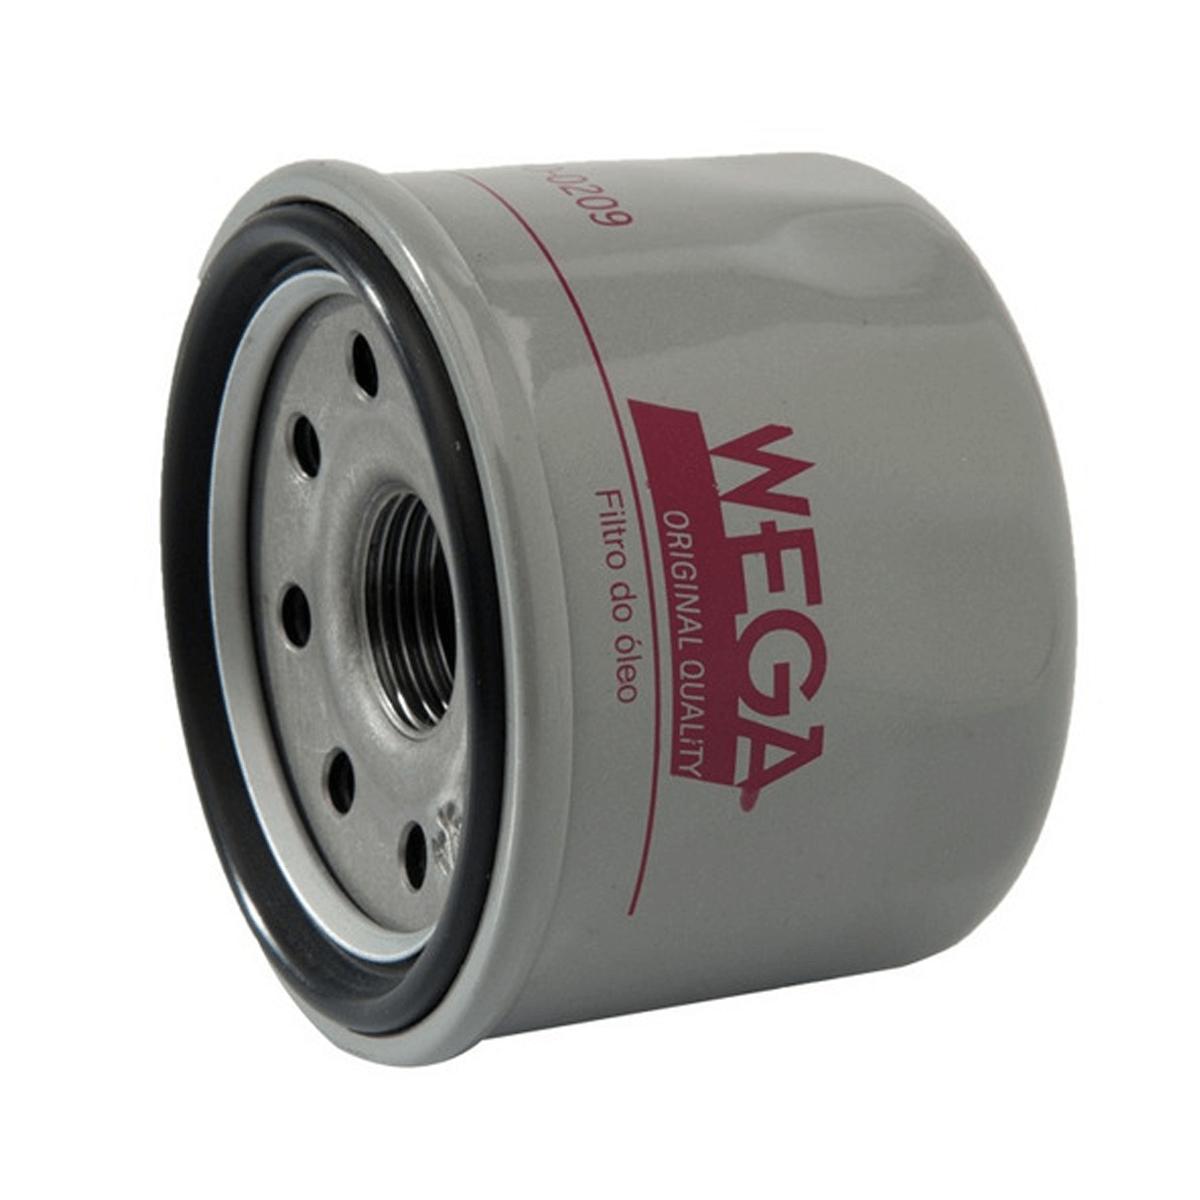 Filtro de Oleo Etios Wega JFO0209 / Tecfil PSL915 em até 6x sem juros